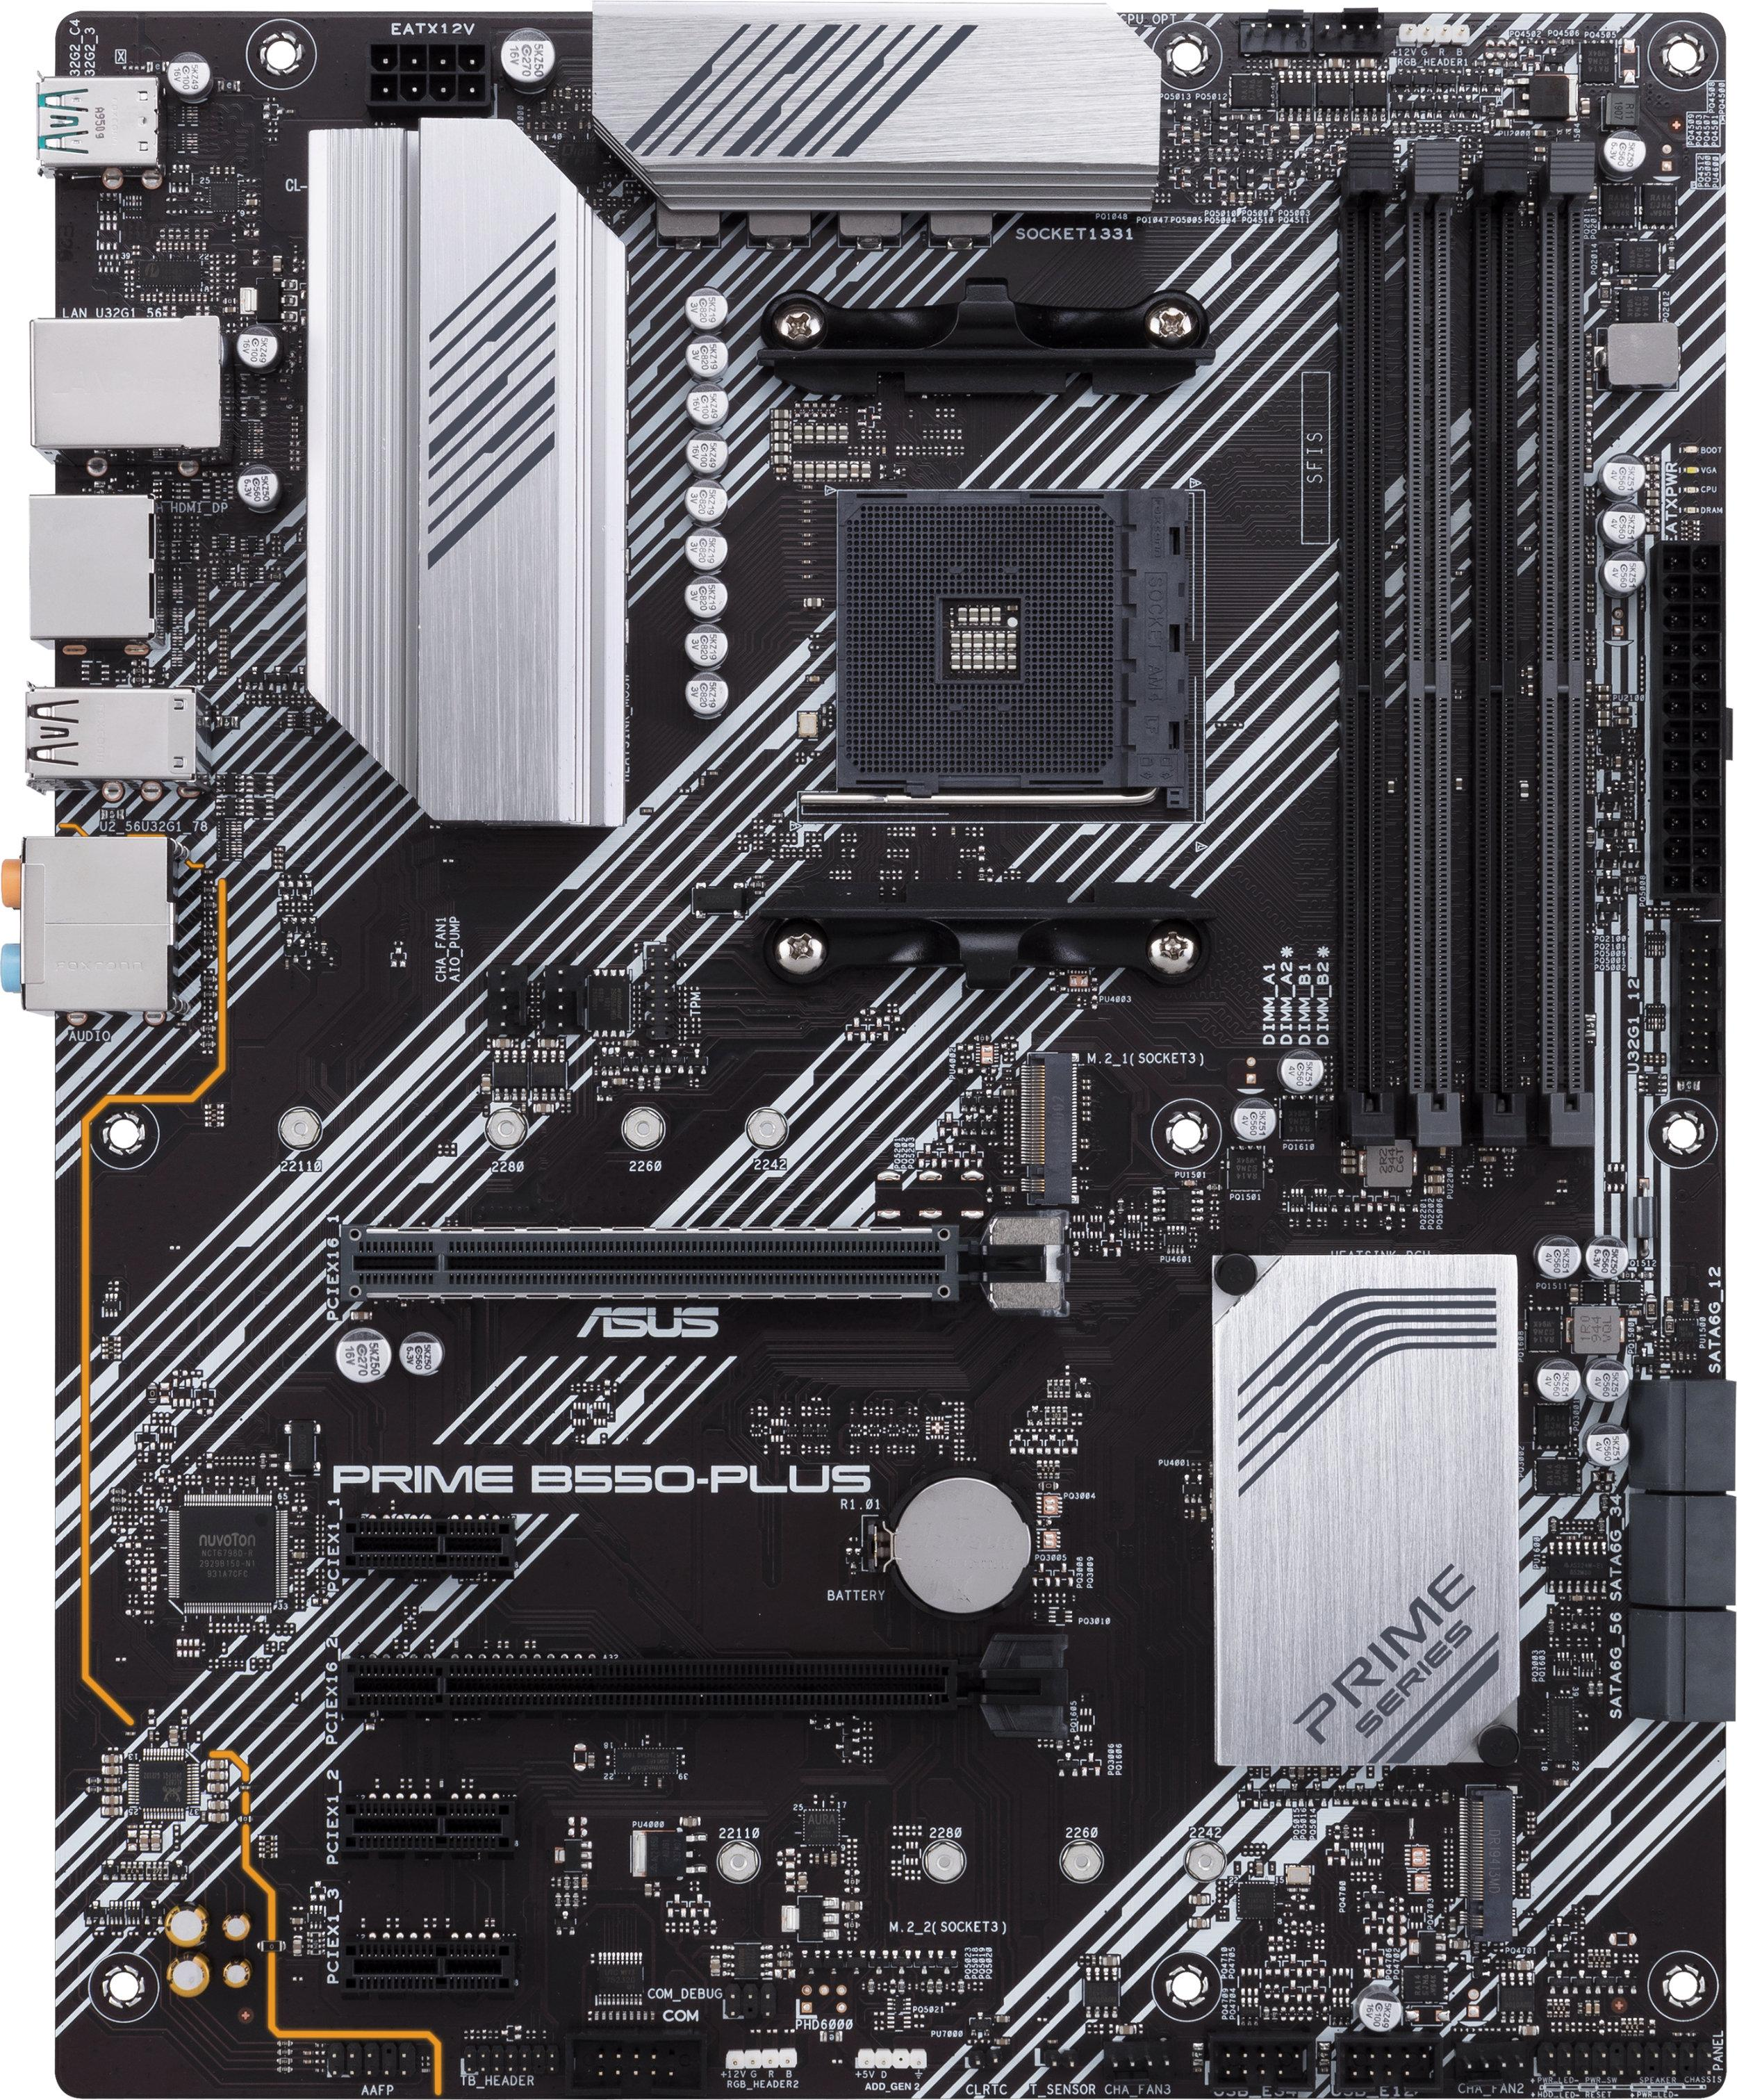 Дънна платка ASUS PRIME B550-PLUS socket AM4, 4xDDR4, Aura Sync, PCIe 4.0, Dual M.2